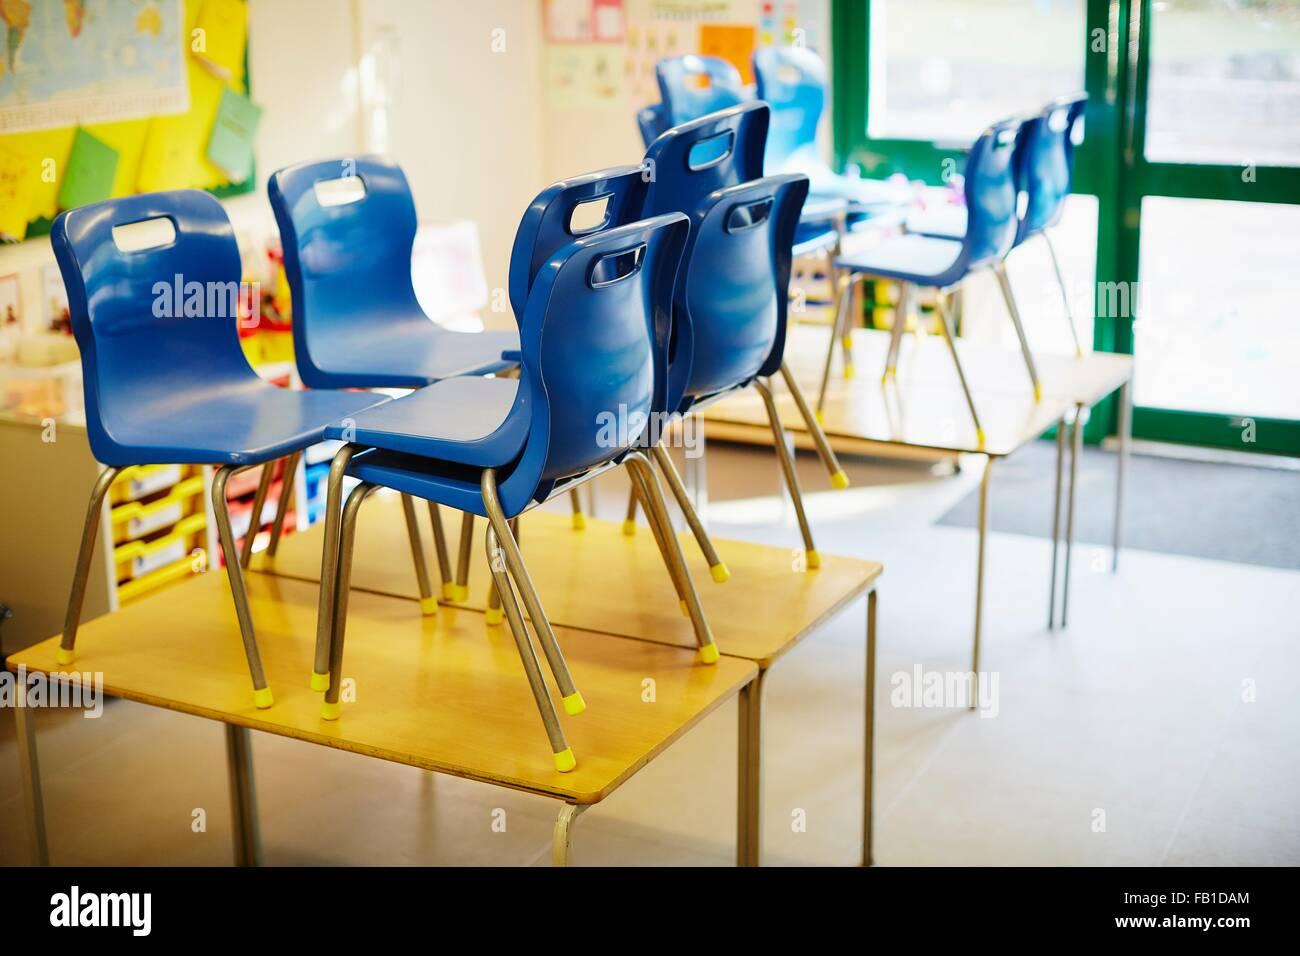 Empty elementary school classroom stockfotos empty for Schreibtisch grundschule